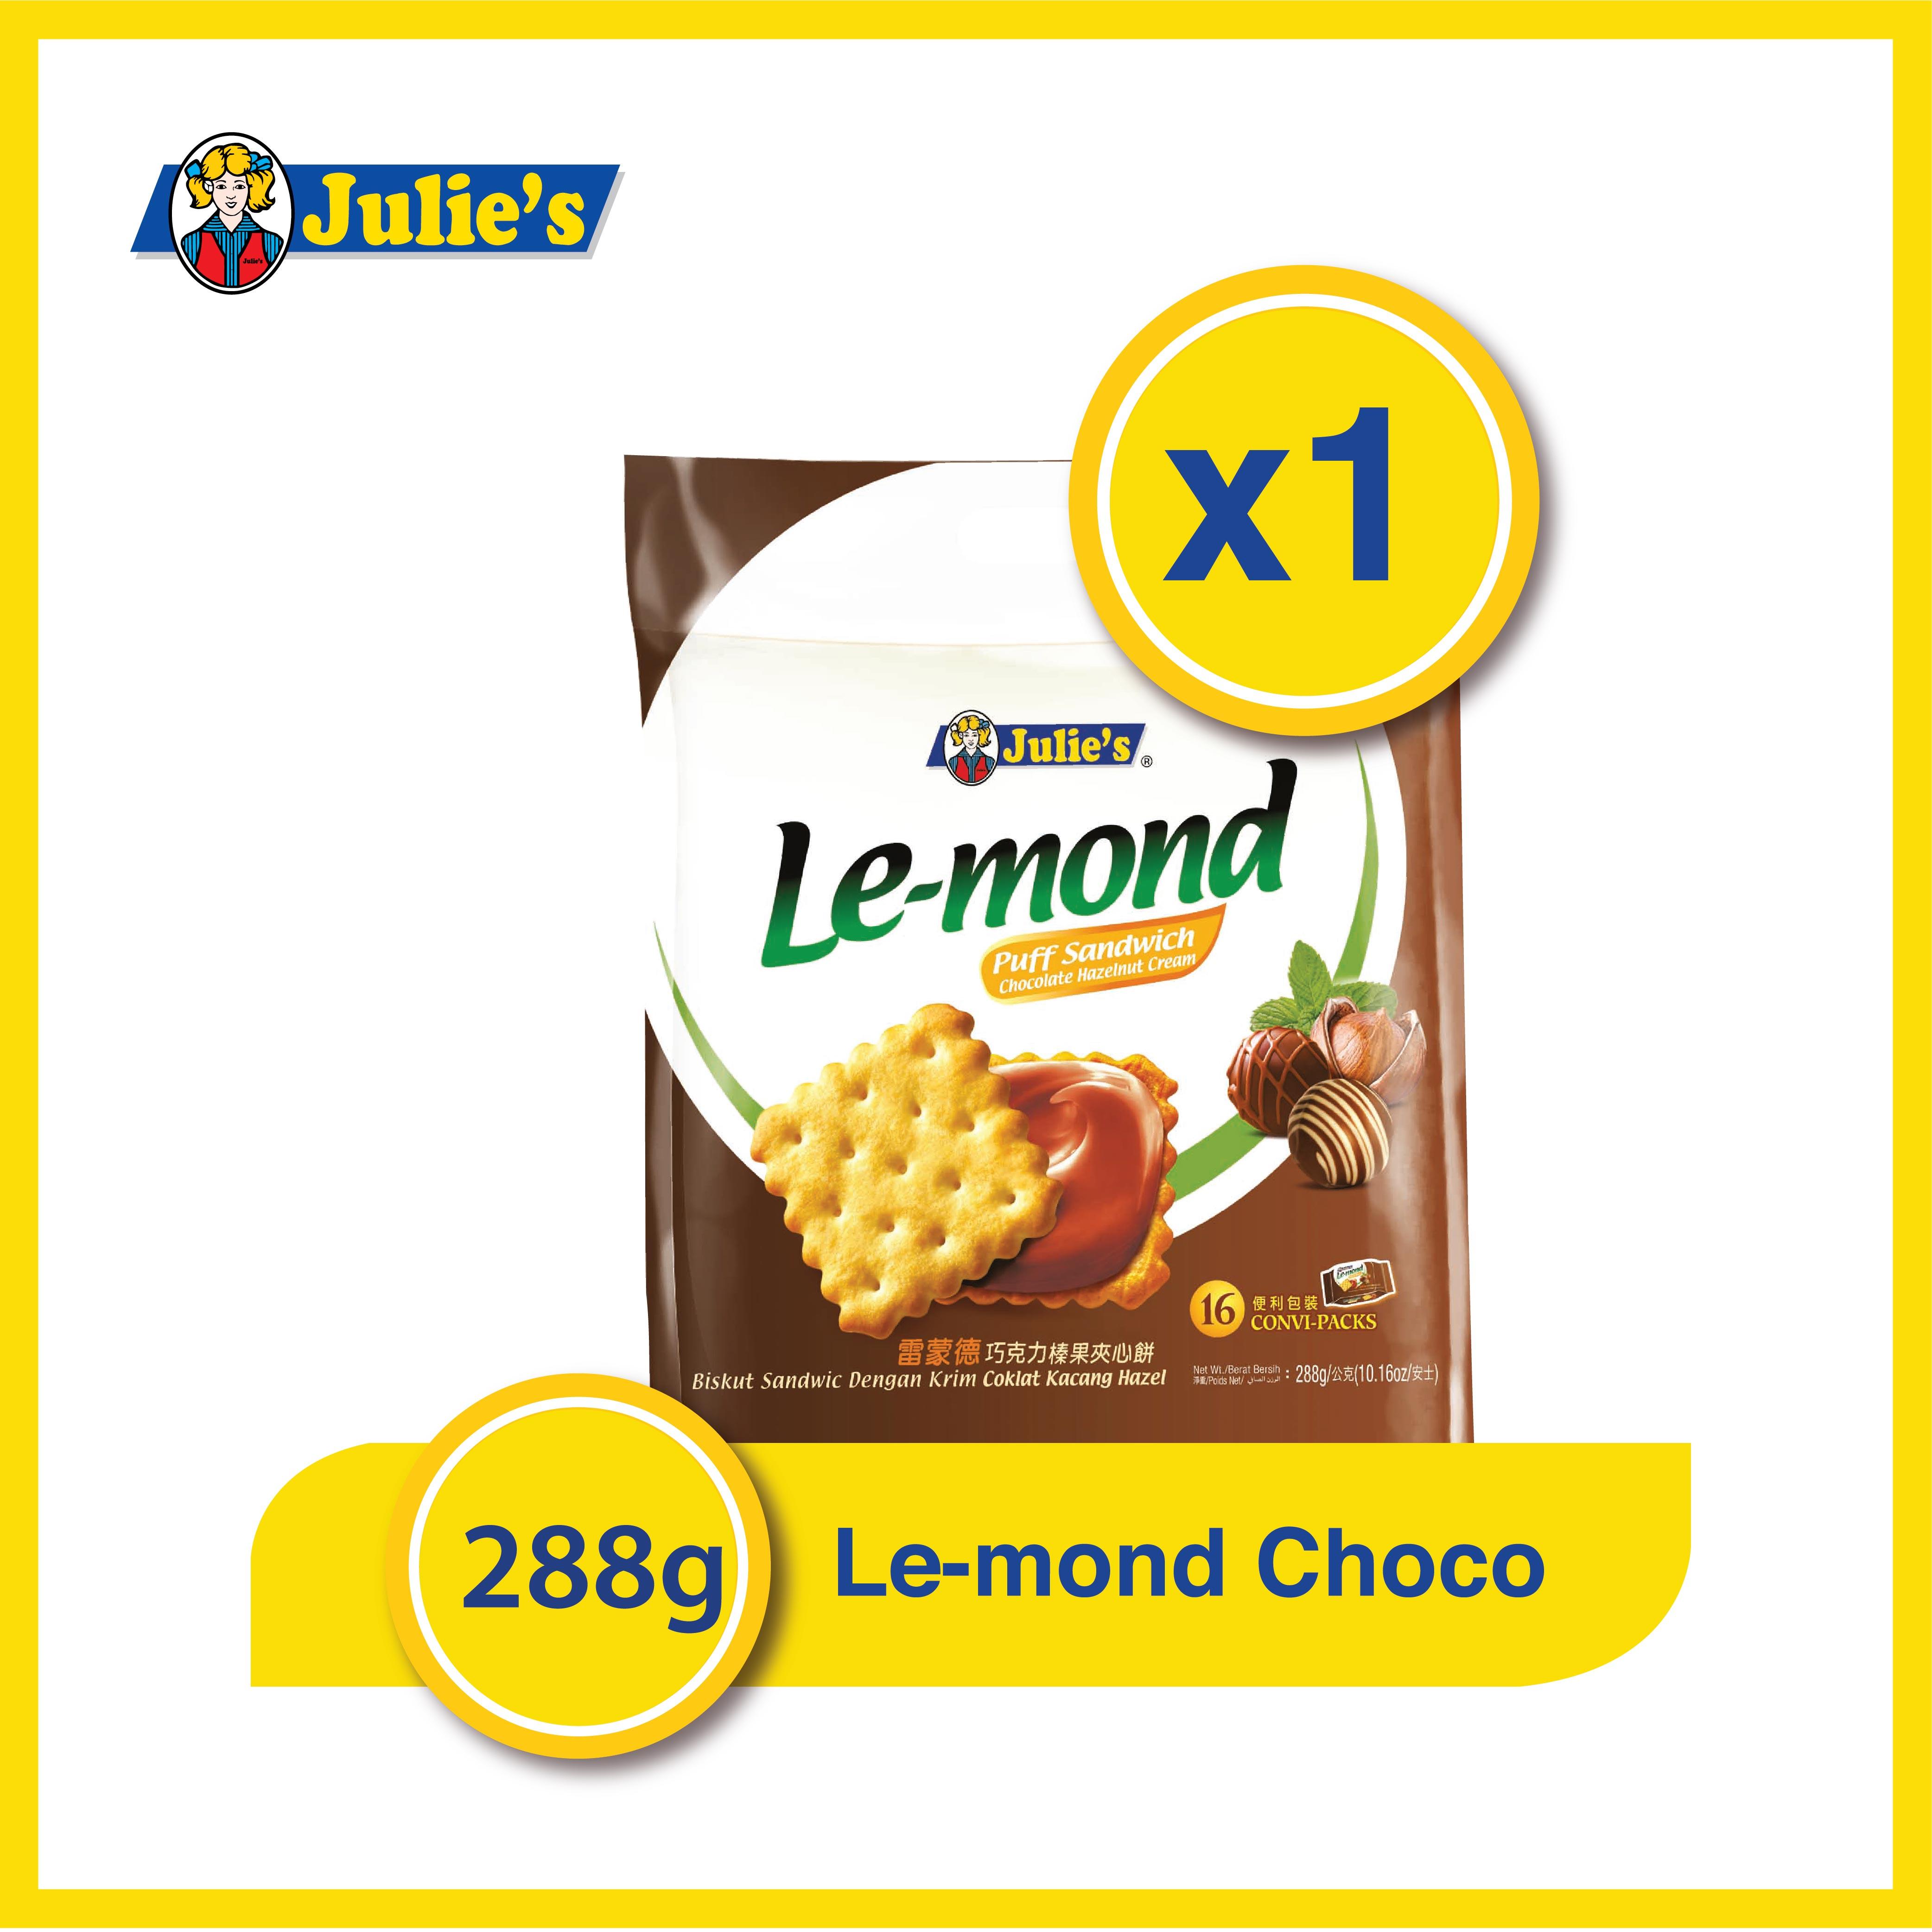 Julie's Le-mond Choc Hazelnut 288g x 1 pack